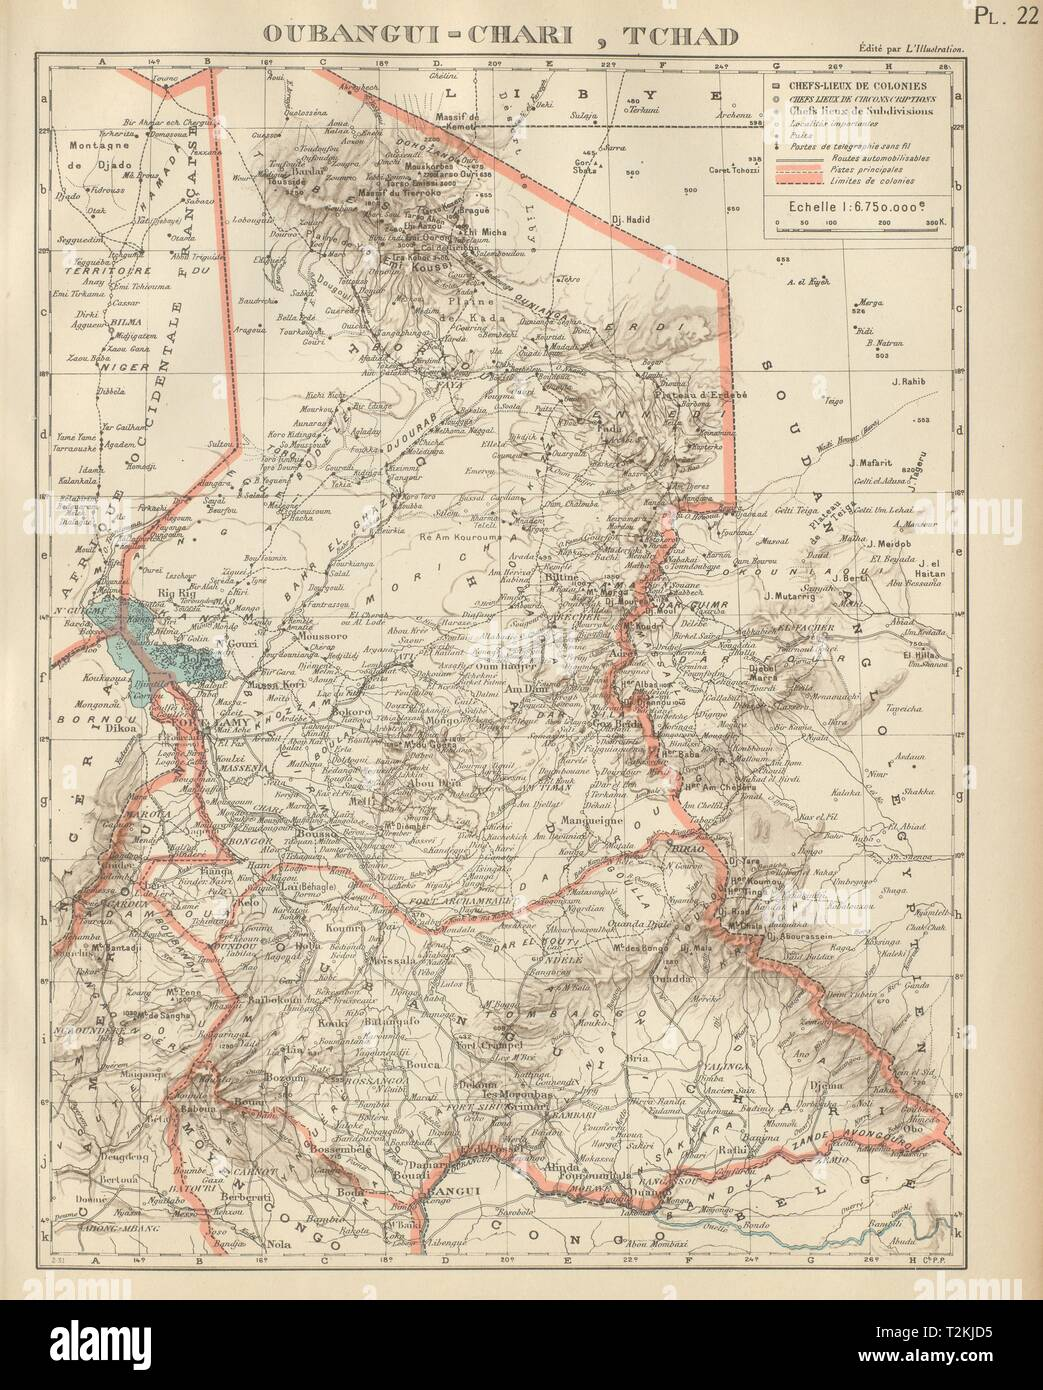 FRENCH COLONIAL CHAD & UBANGI-SHARI (C.A.R.). Oubangui-Chari Tchad 1931 map - Stock Image